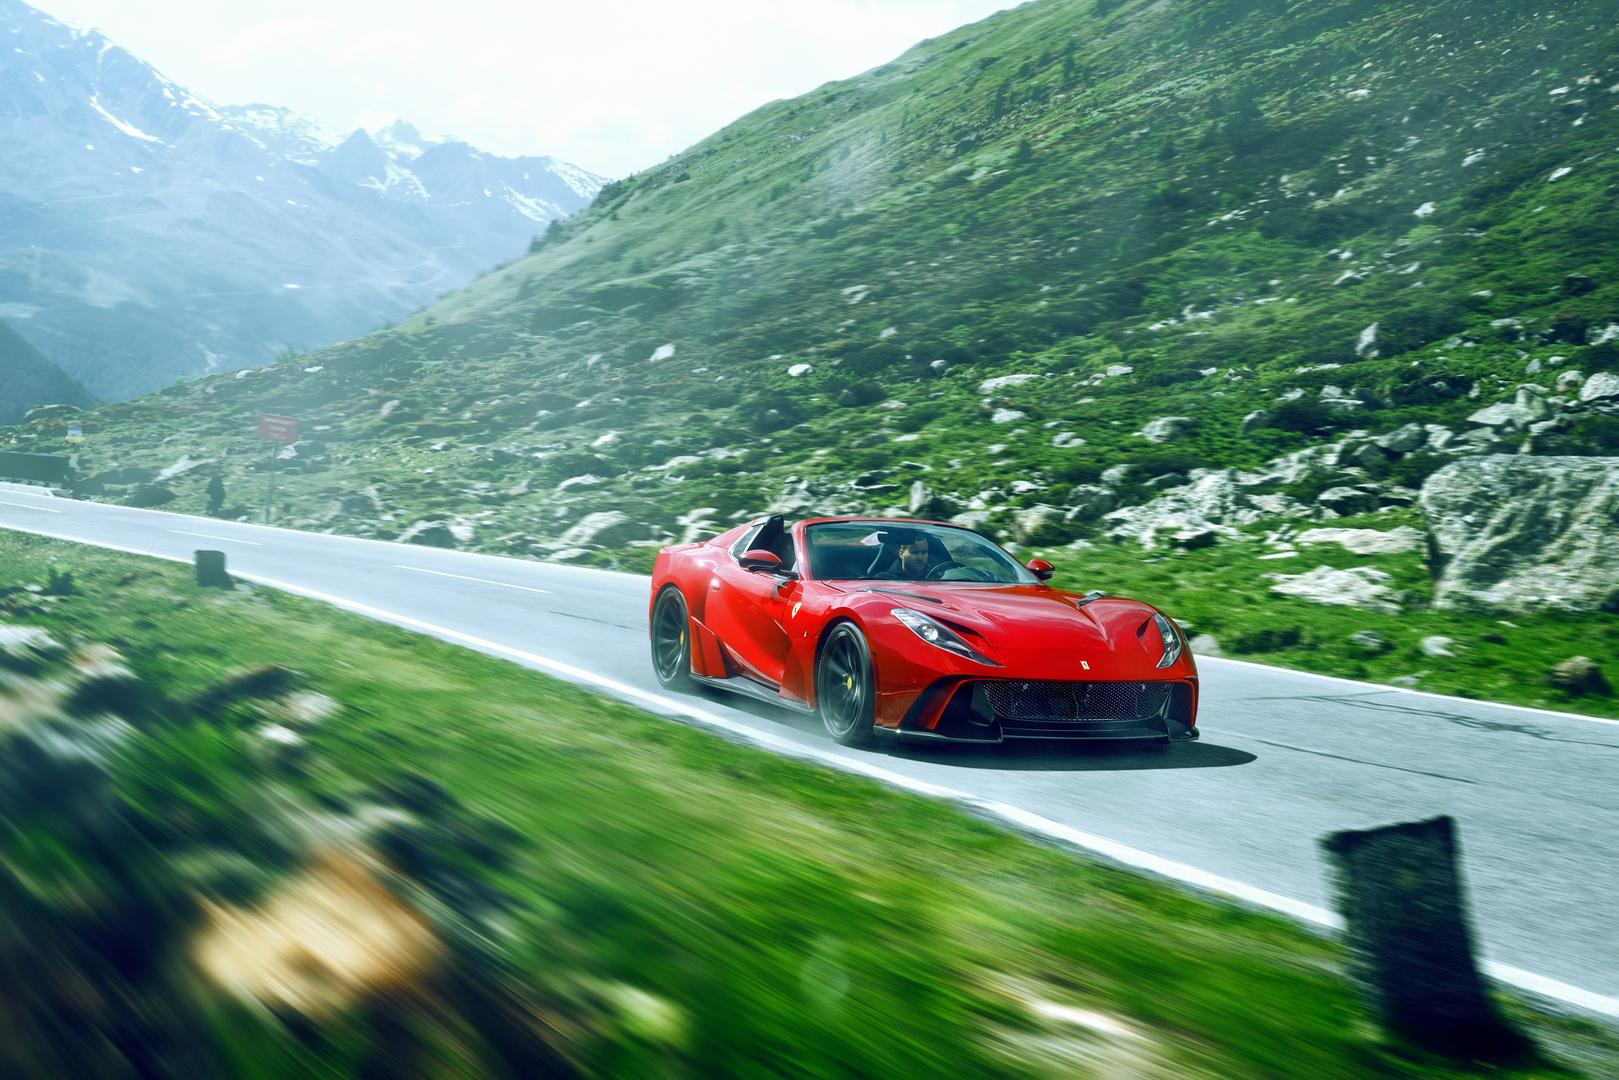 Ferrari 812 GTS wallpaper